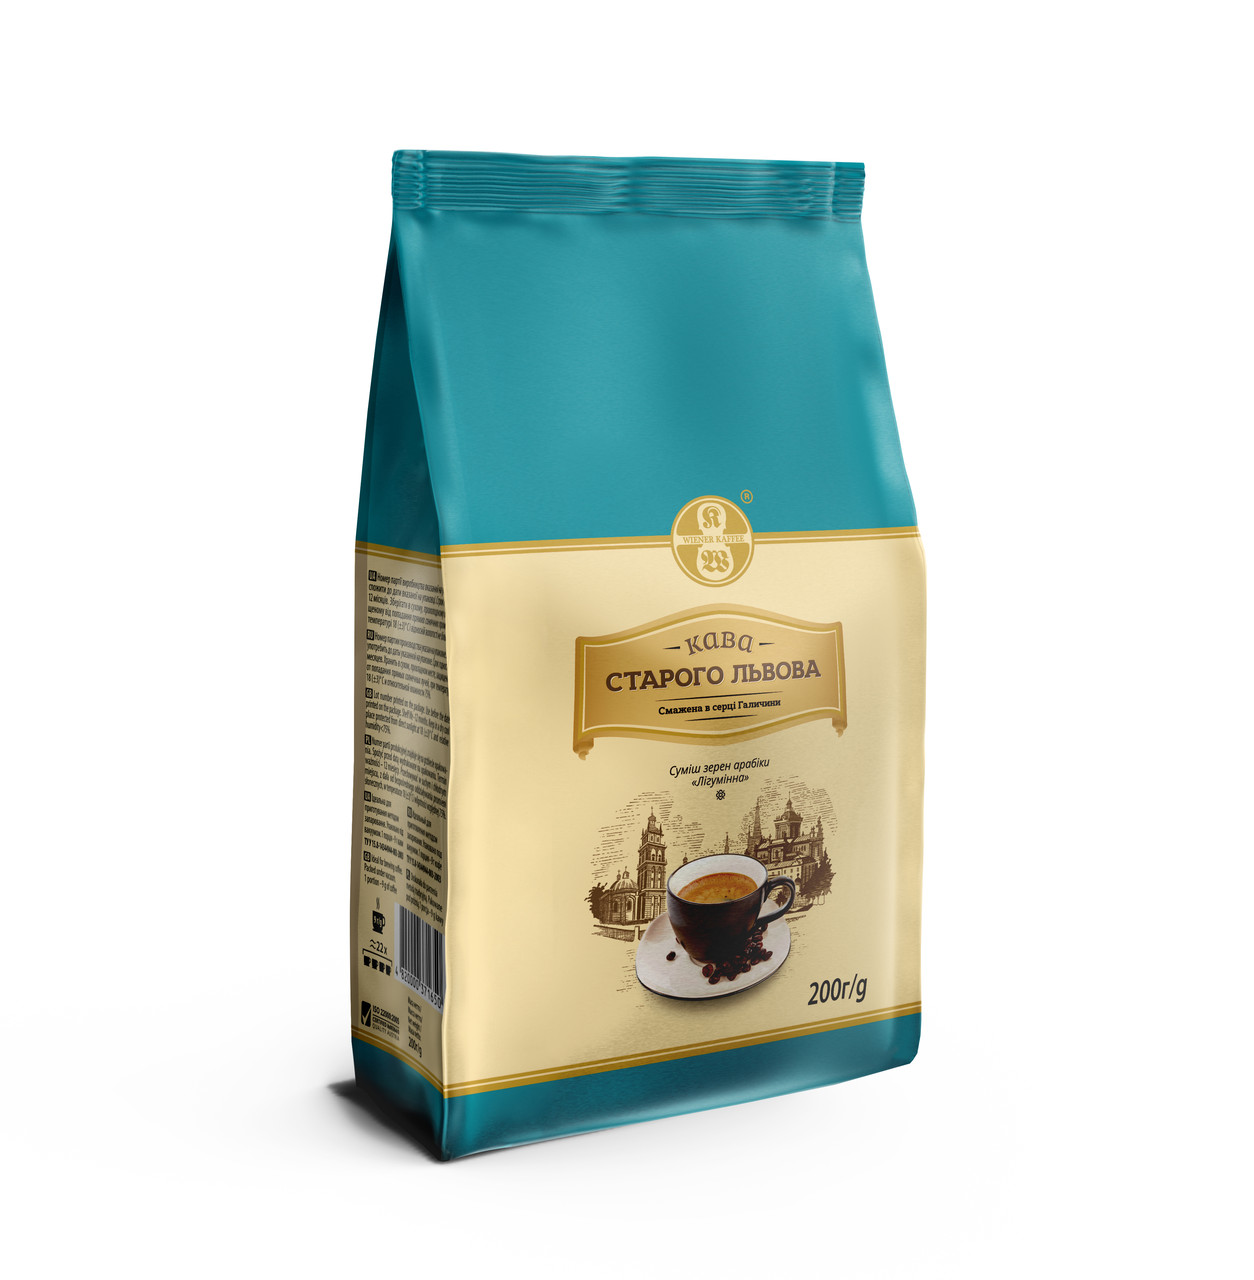 Молотый кофе Кава Старого Львова Лігуміннас ароматом ирландского крема 200 грамм в мягкой упаковке